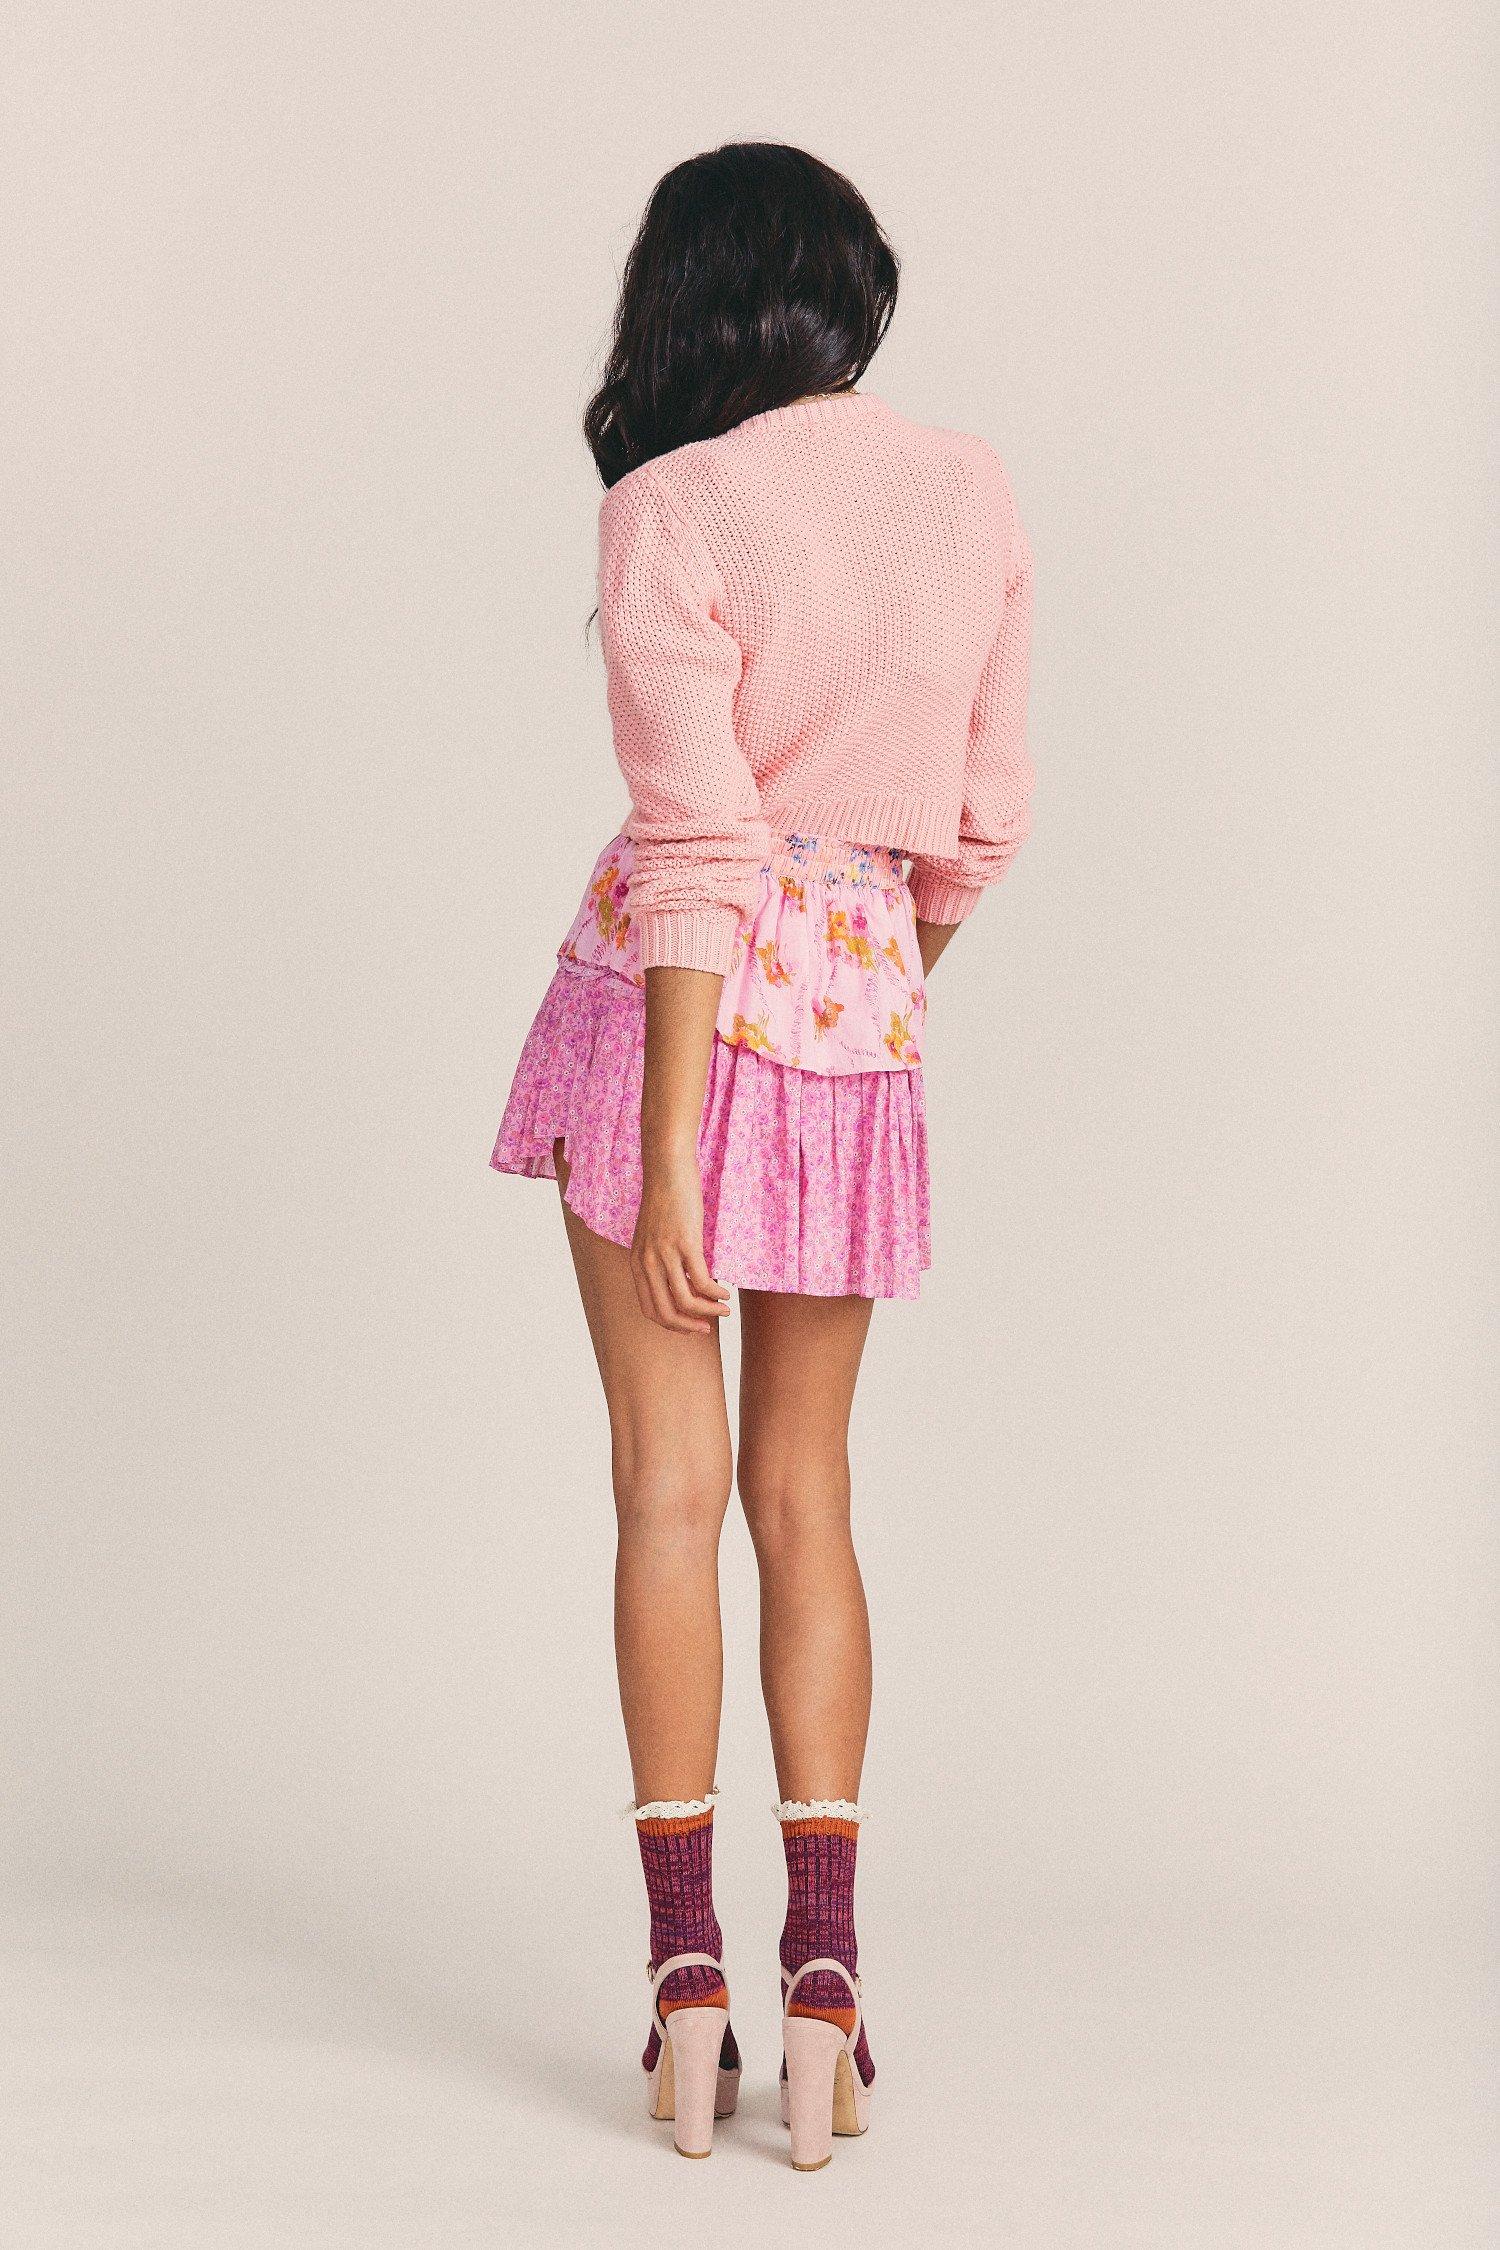 Ruffle-Mini-Skirt-Exploded-Pink-4